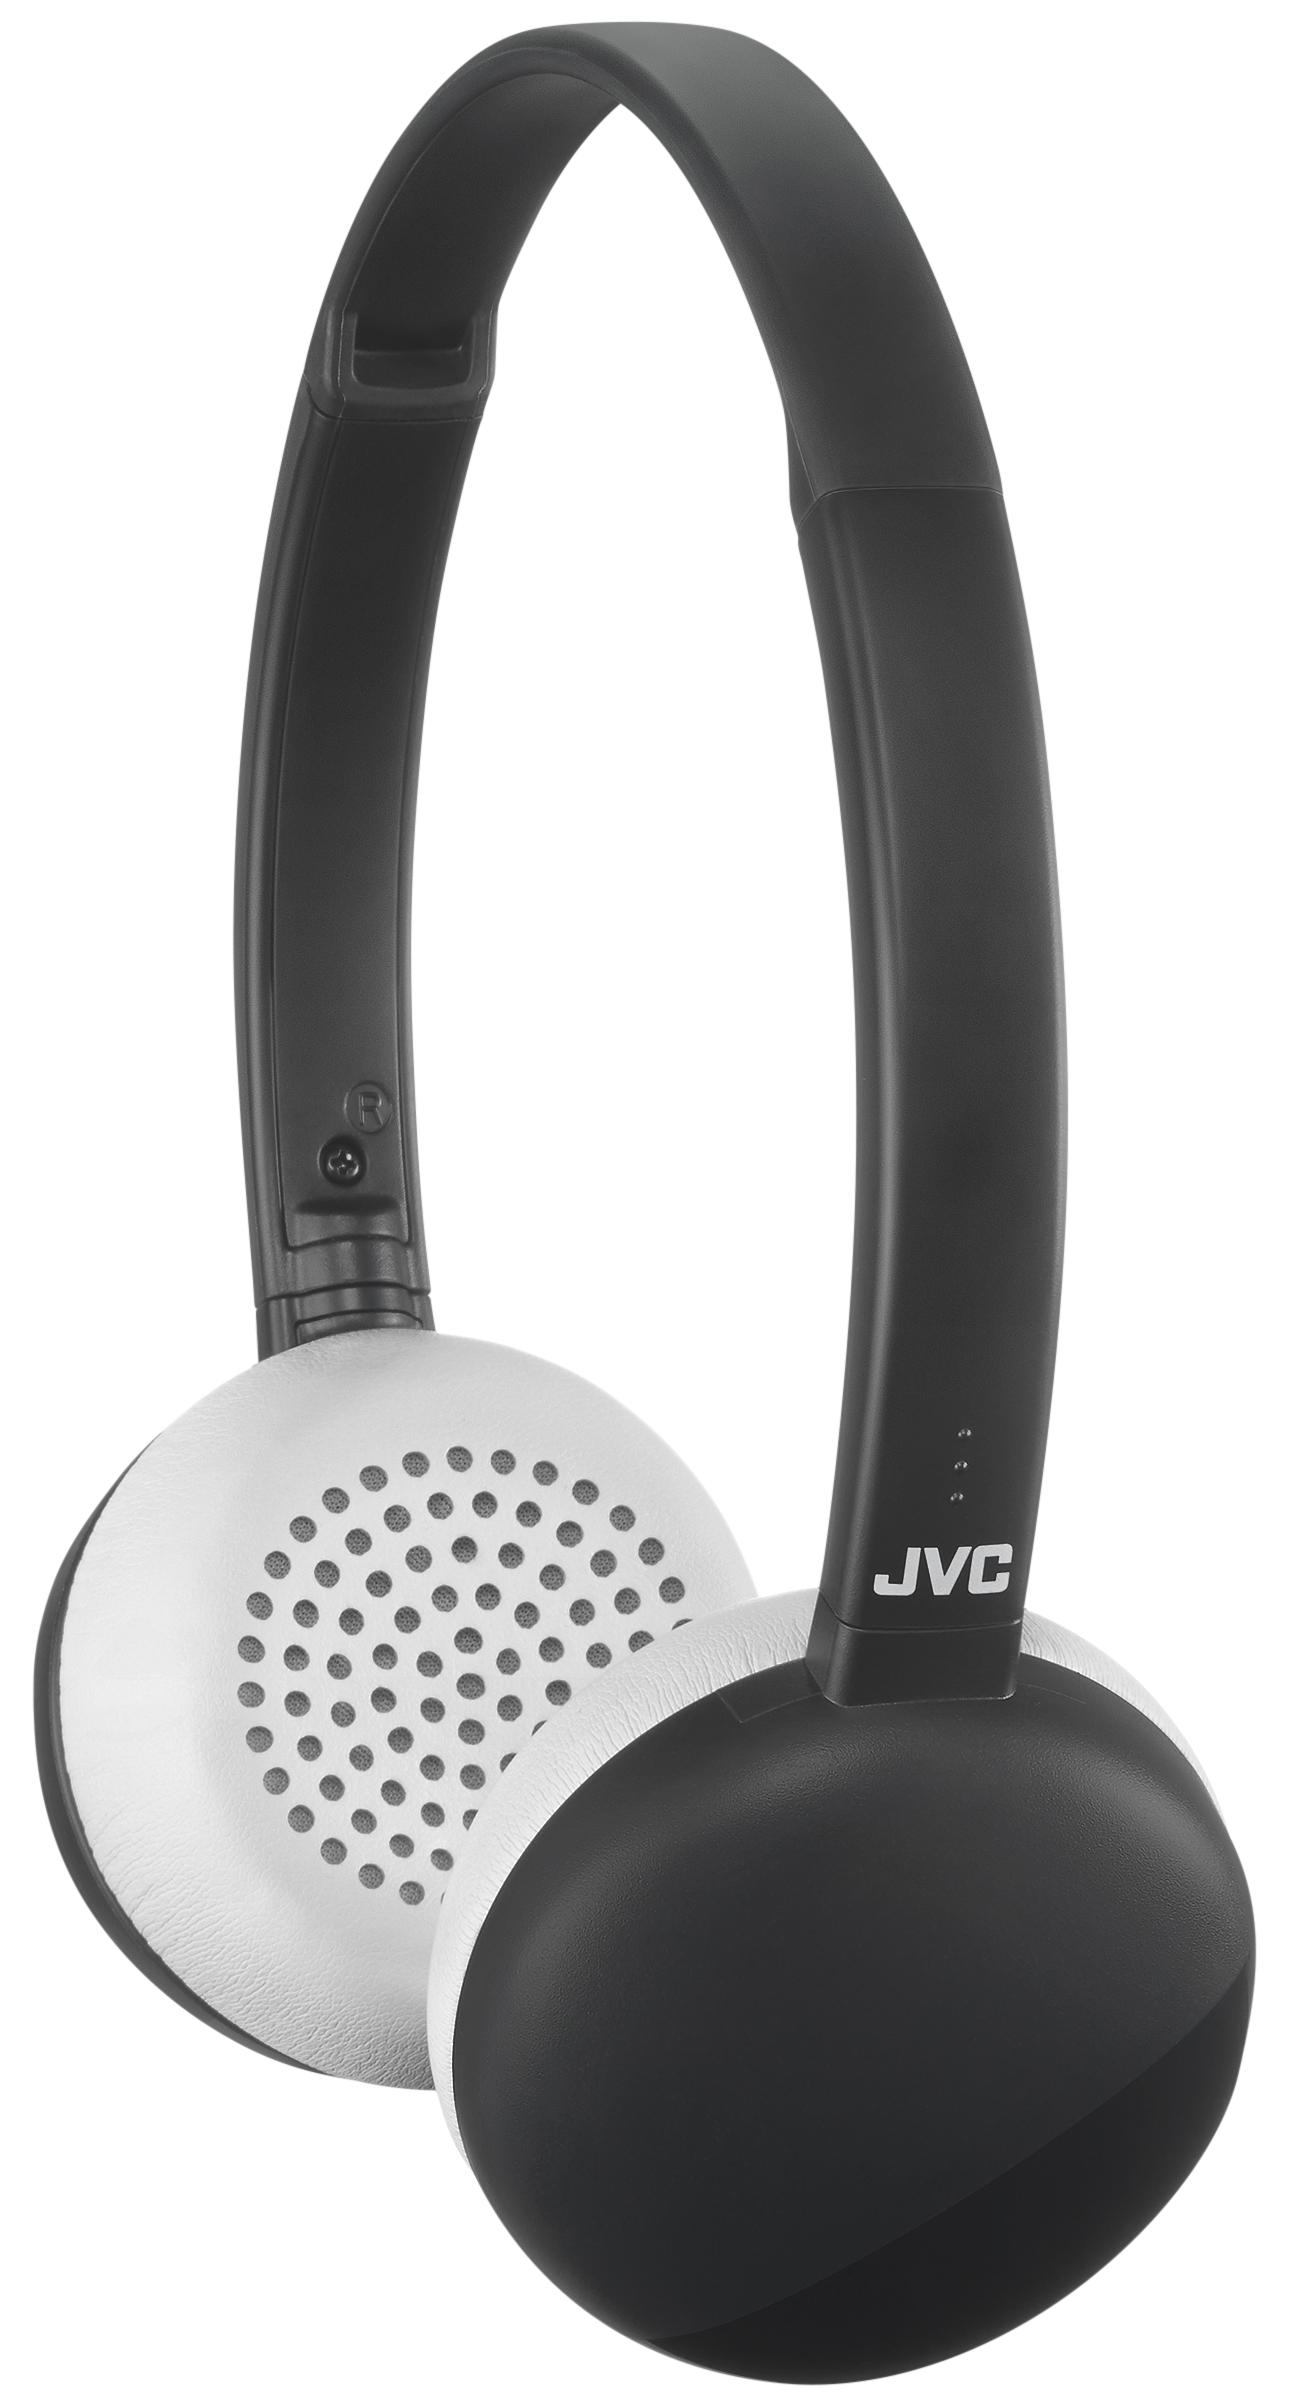 Earbud bluetooth wireless - jvc earbuds bluetooth wireless